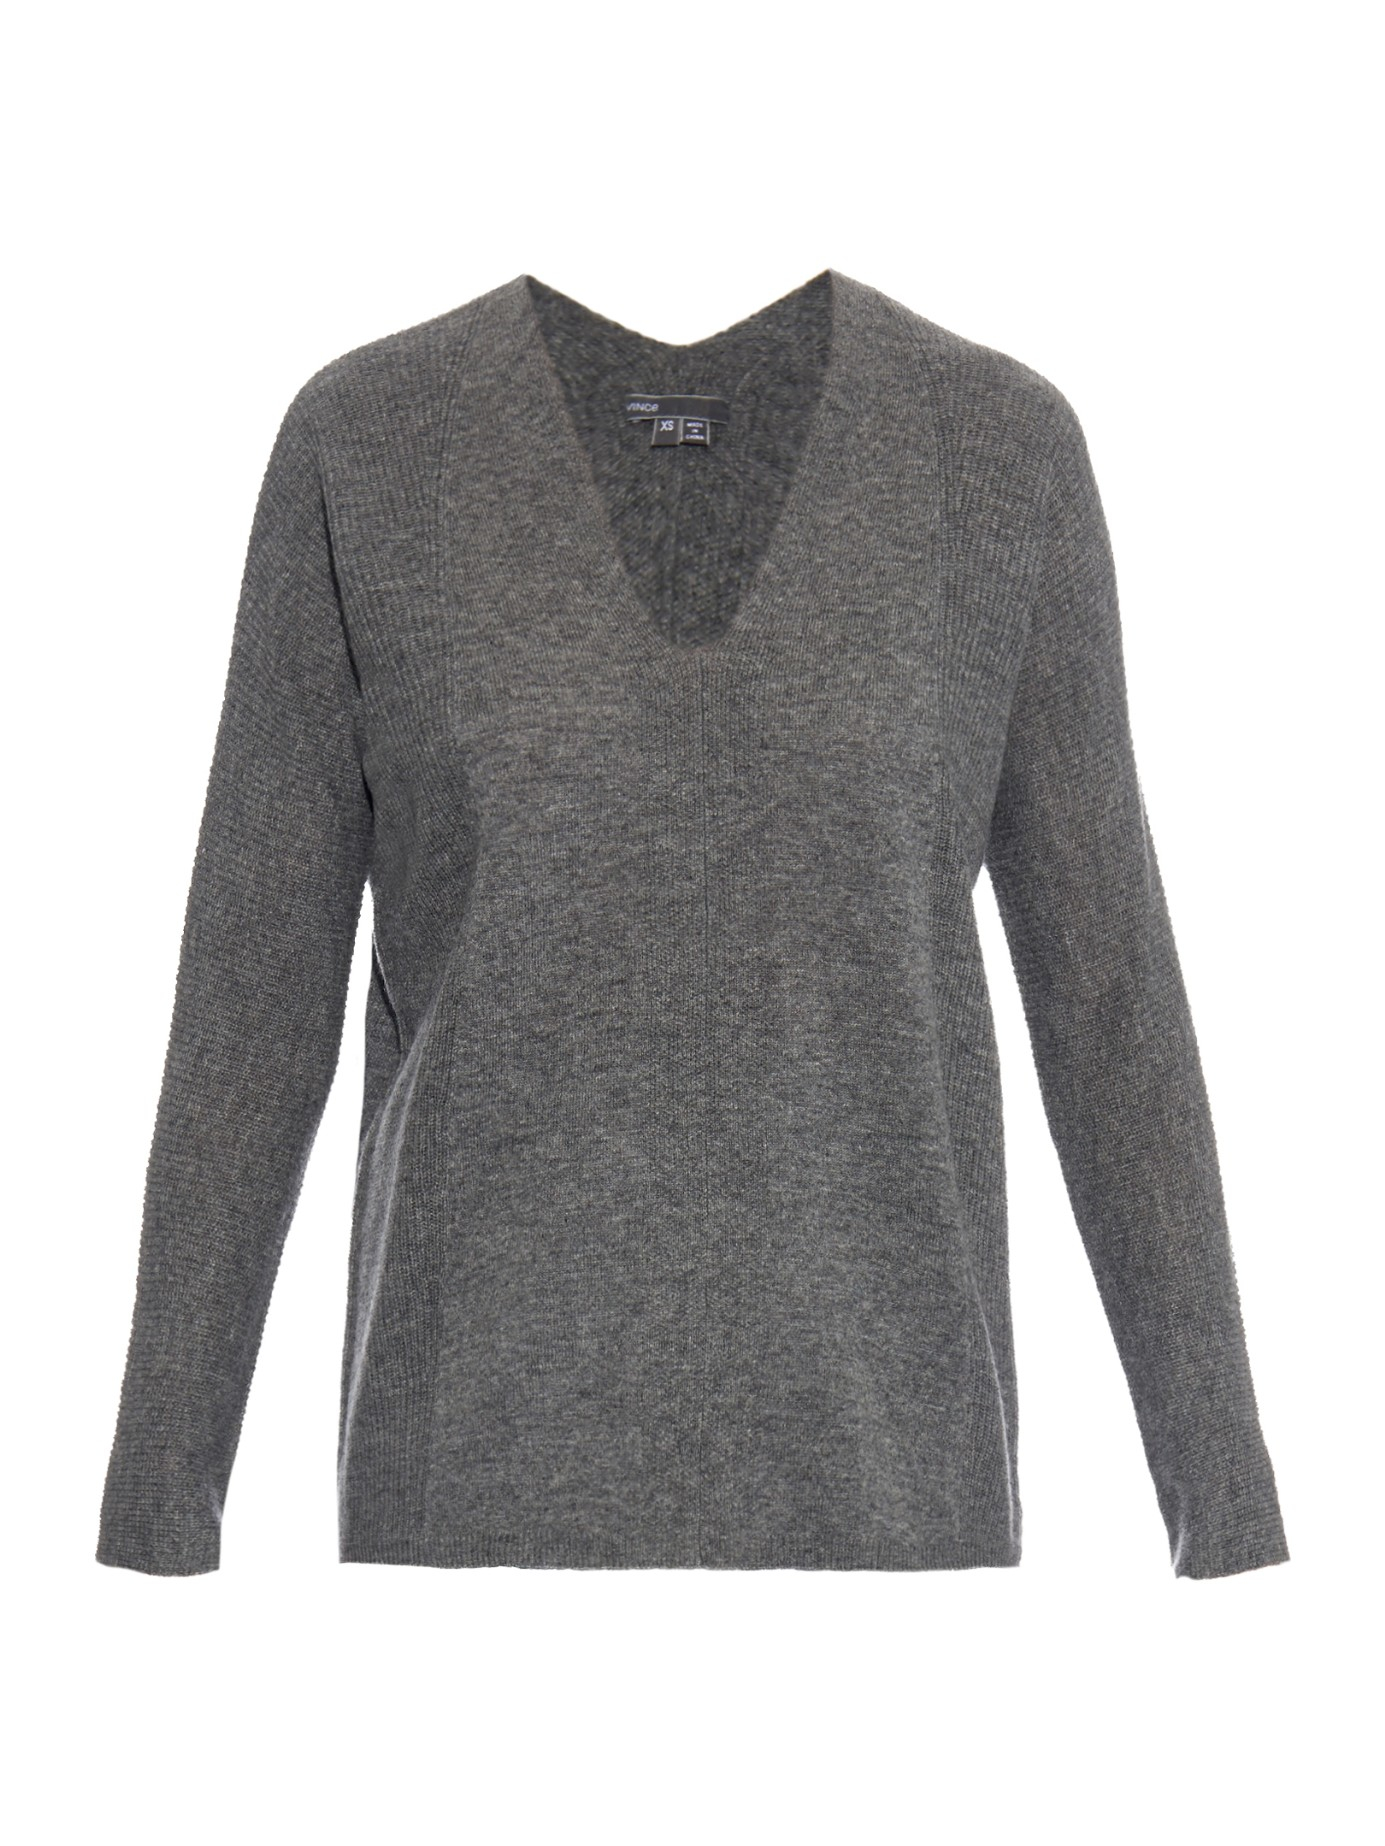 Grey Cashmere V Neck Sweater 94